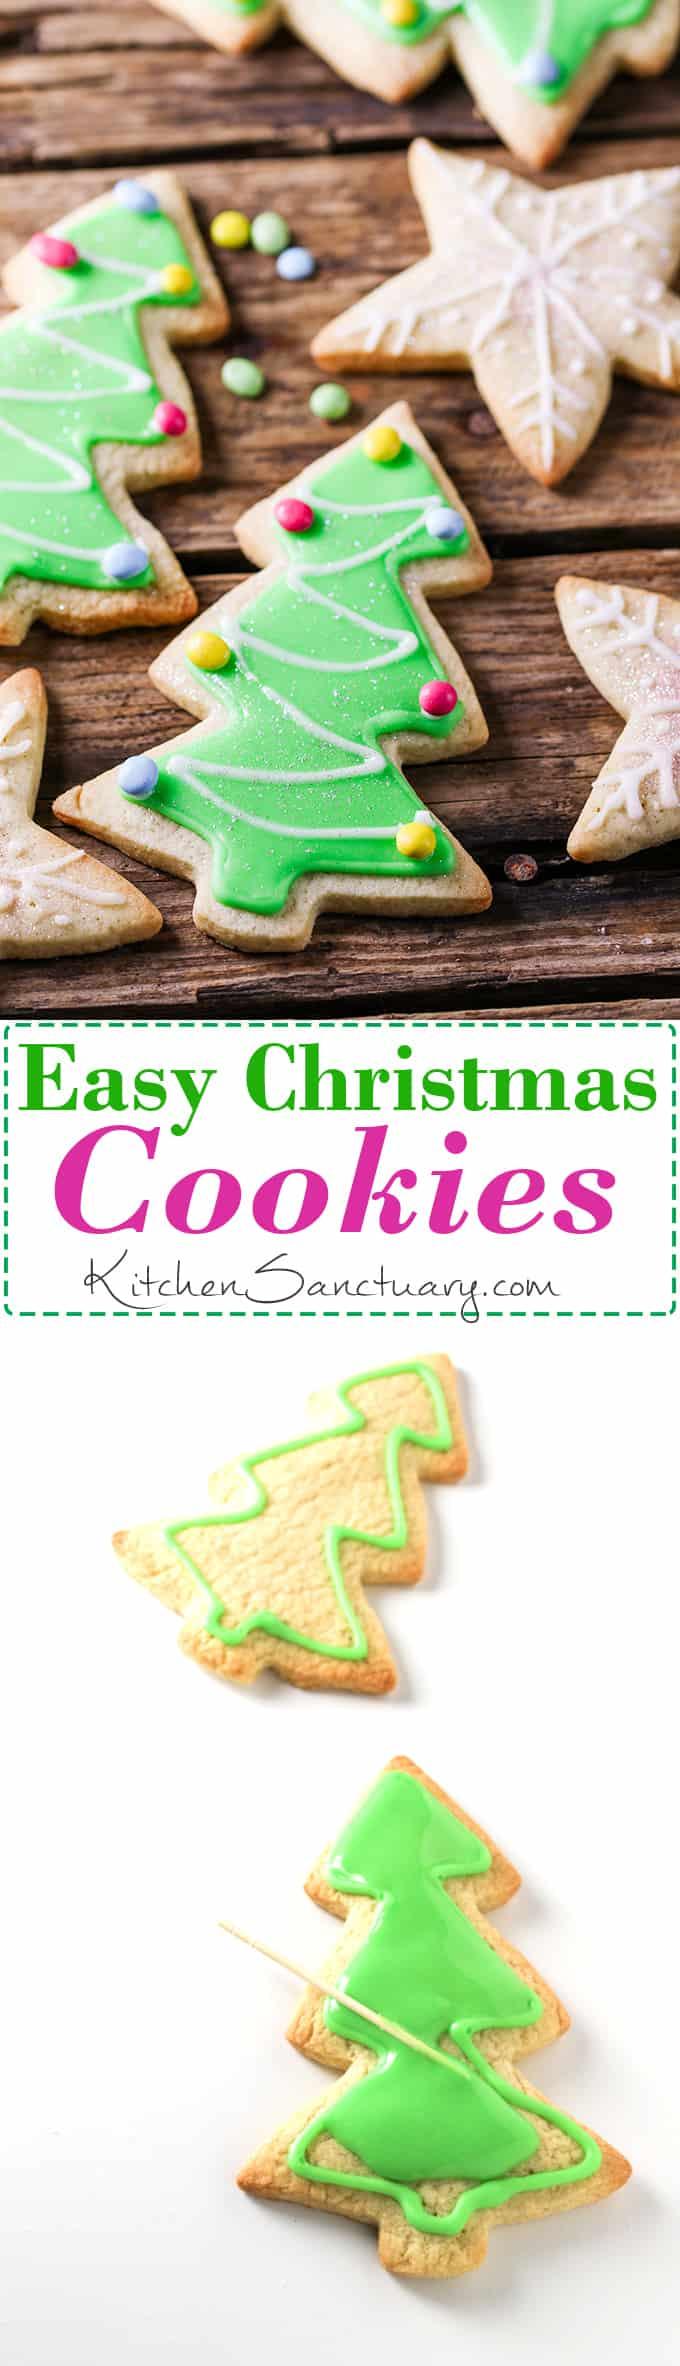 How to make christmas sugar cookies - How To Make Christmas Sugar Cookies With Simple Icing